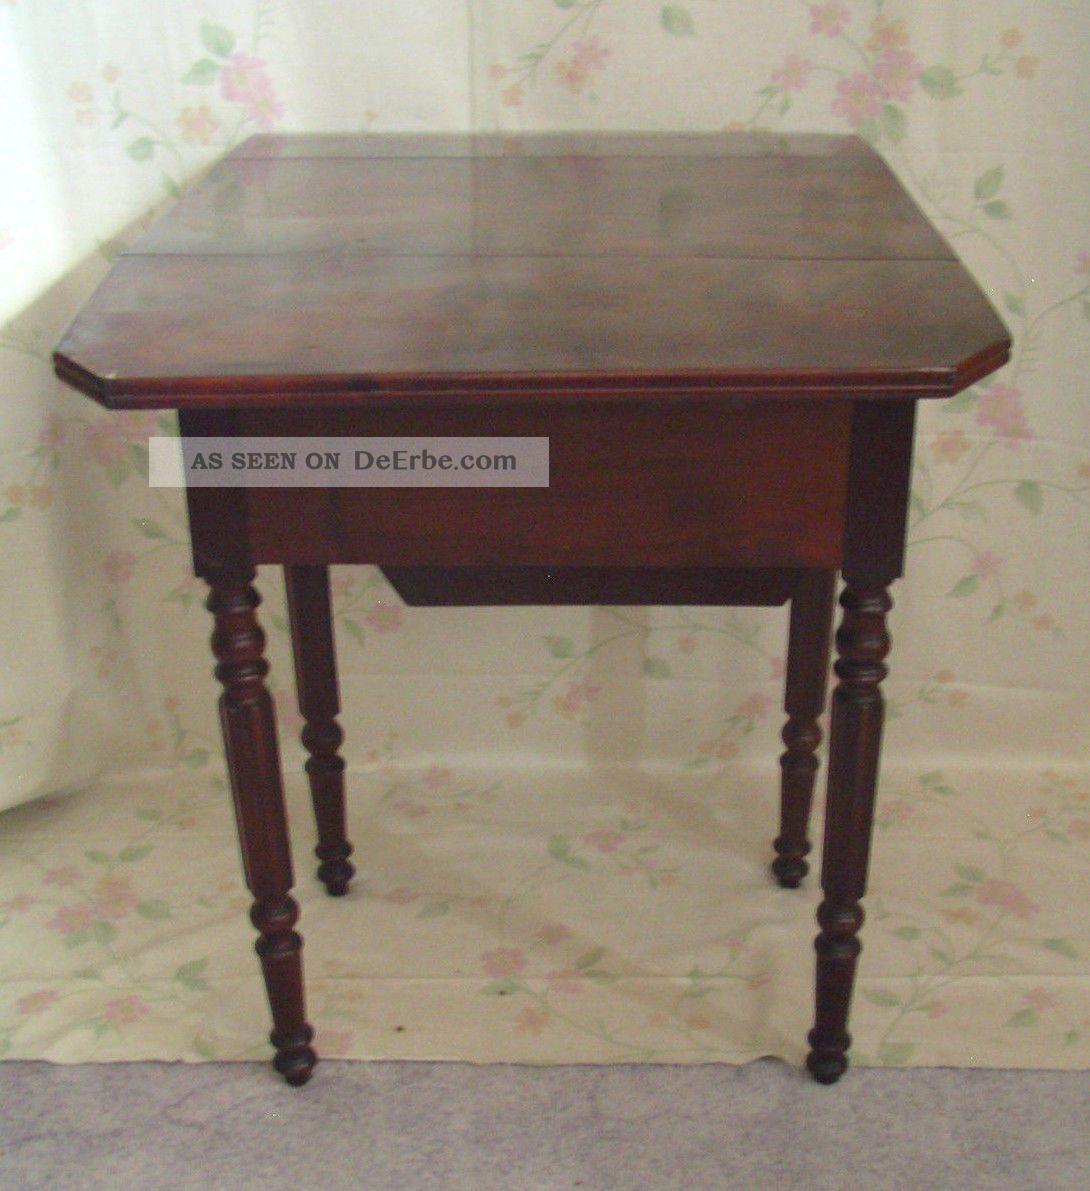 antik pembroke tisch klapptisch wurzelholz louis philippe frankreich shabby chic. Black Bedroom Furniture Sets. Home Design Ideas